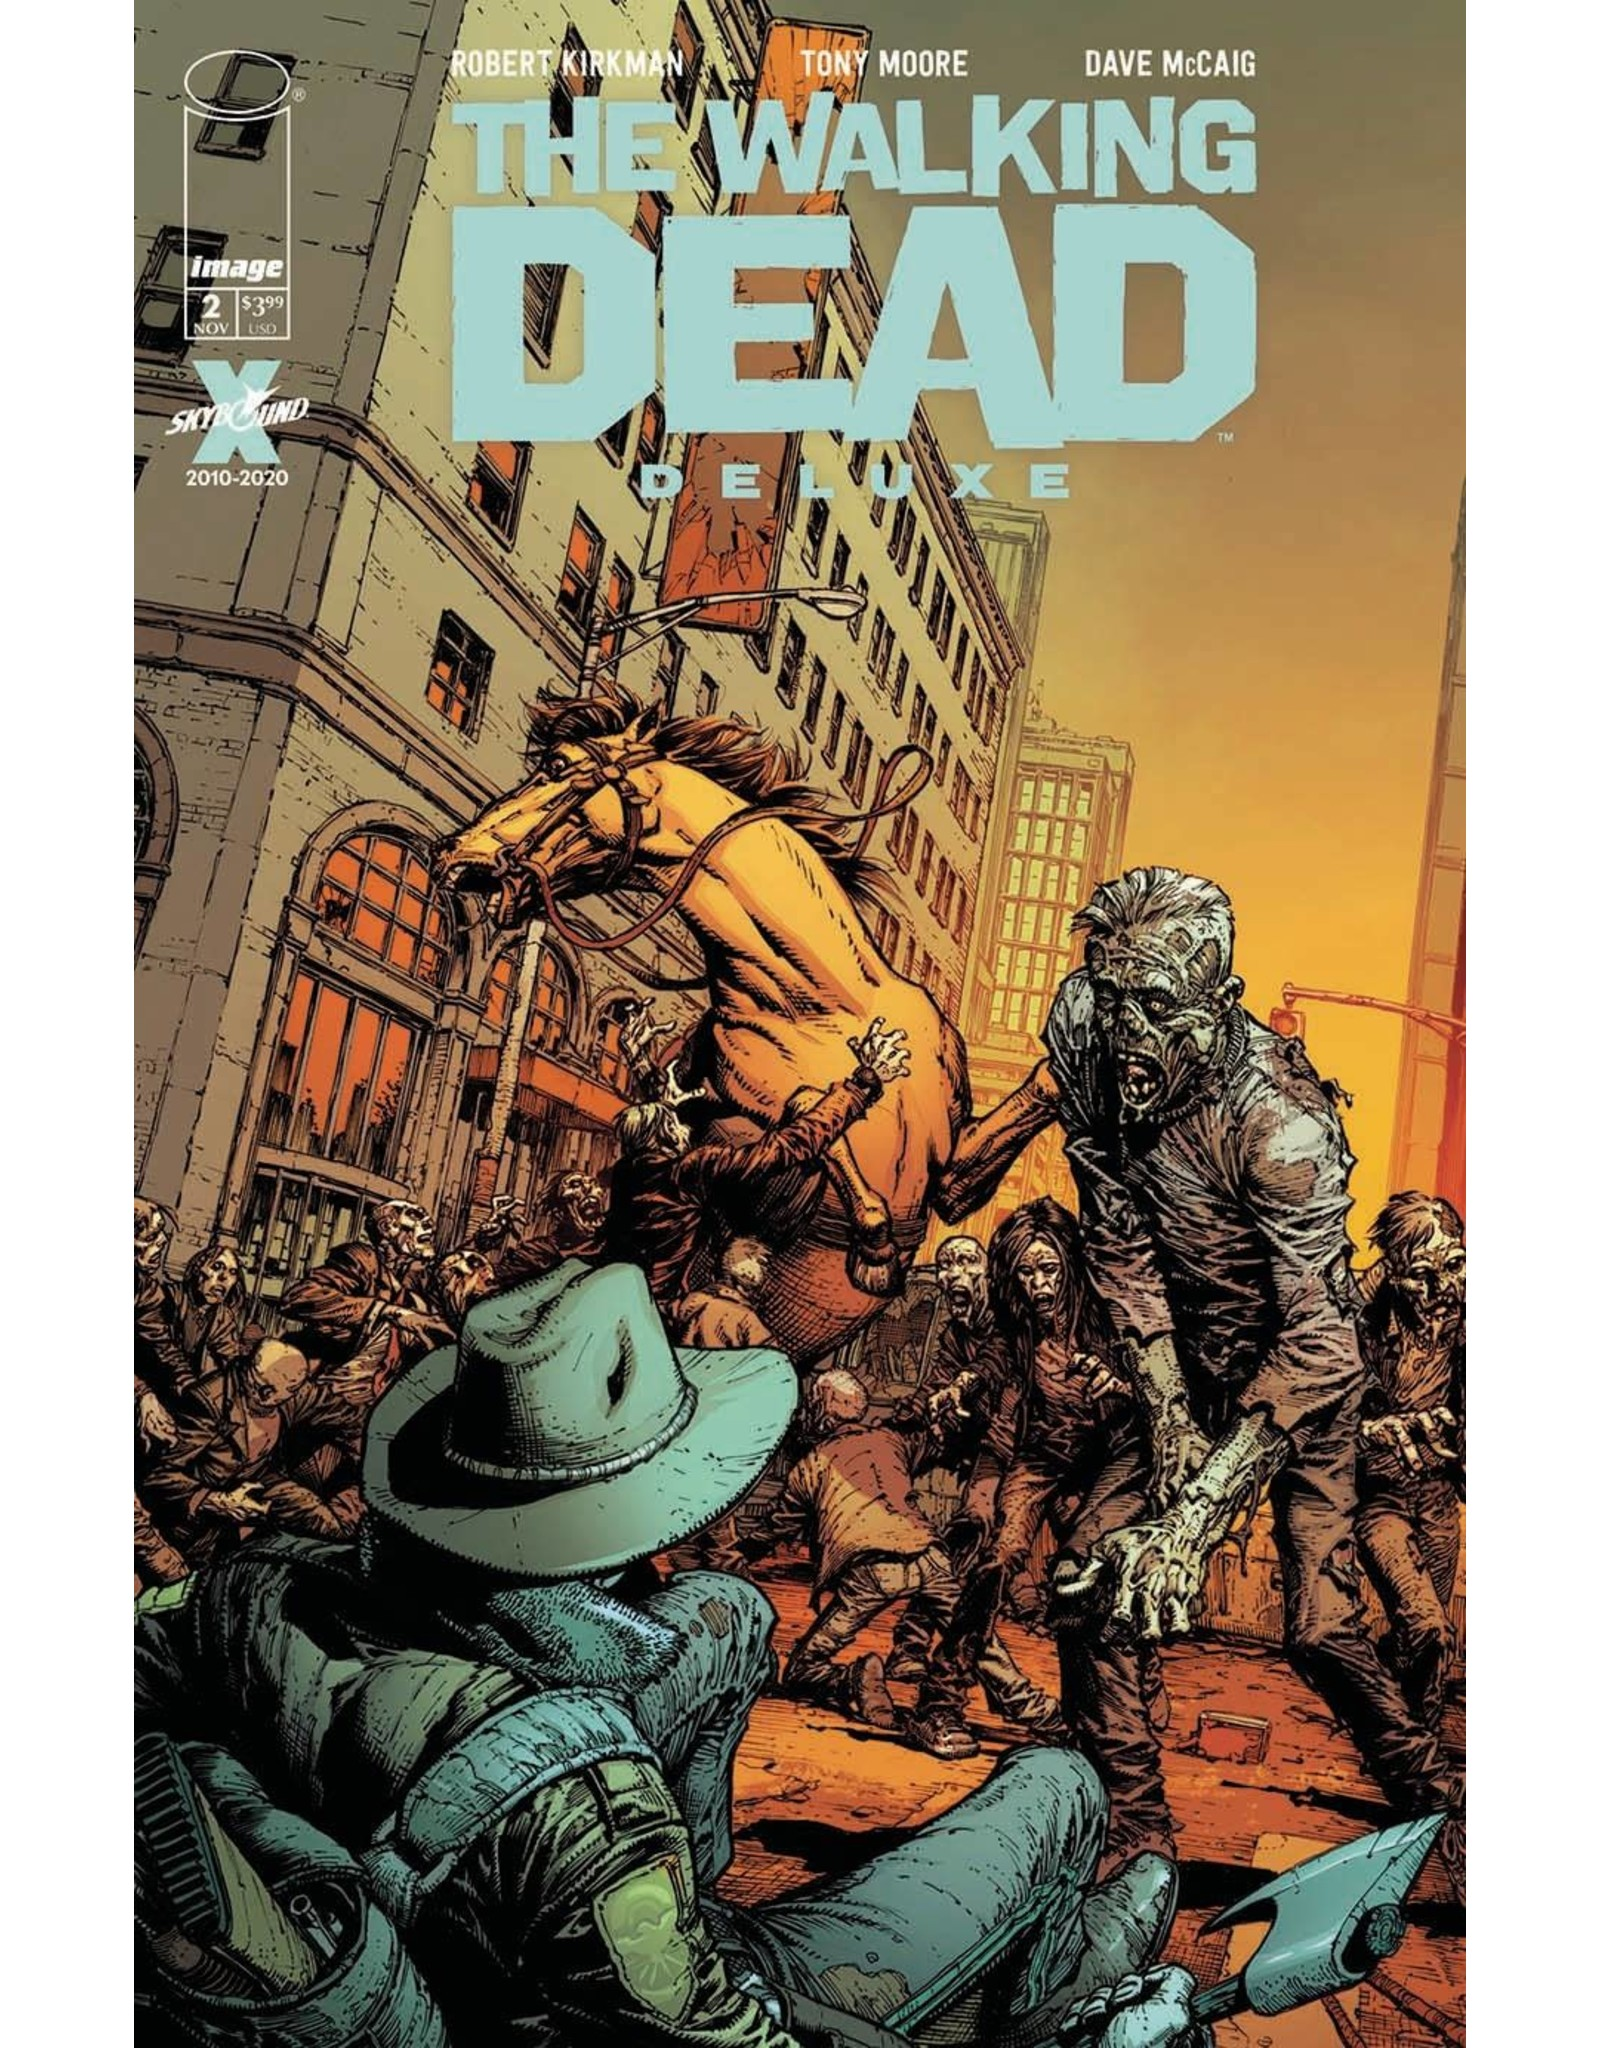 Image Comics WALKING DEAD DLX #2 CVR A FINCH & MCCAIG (MR)